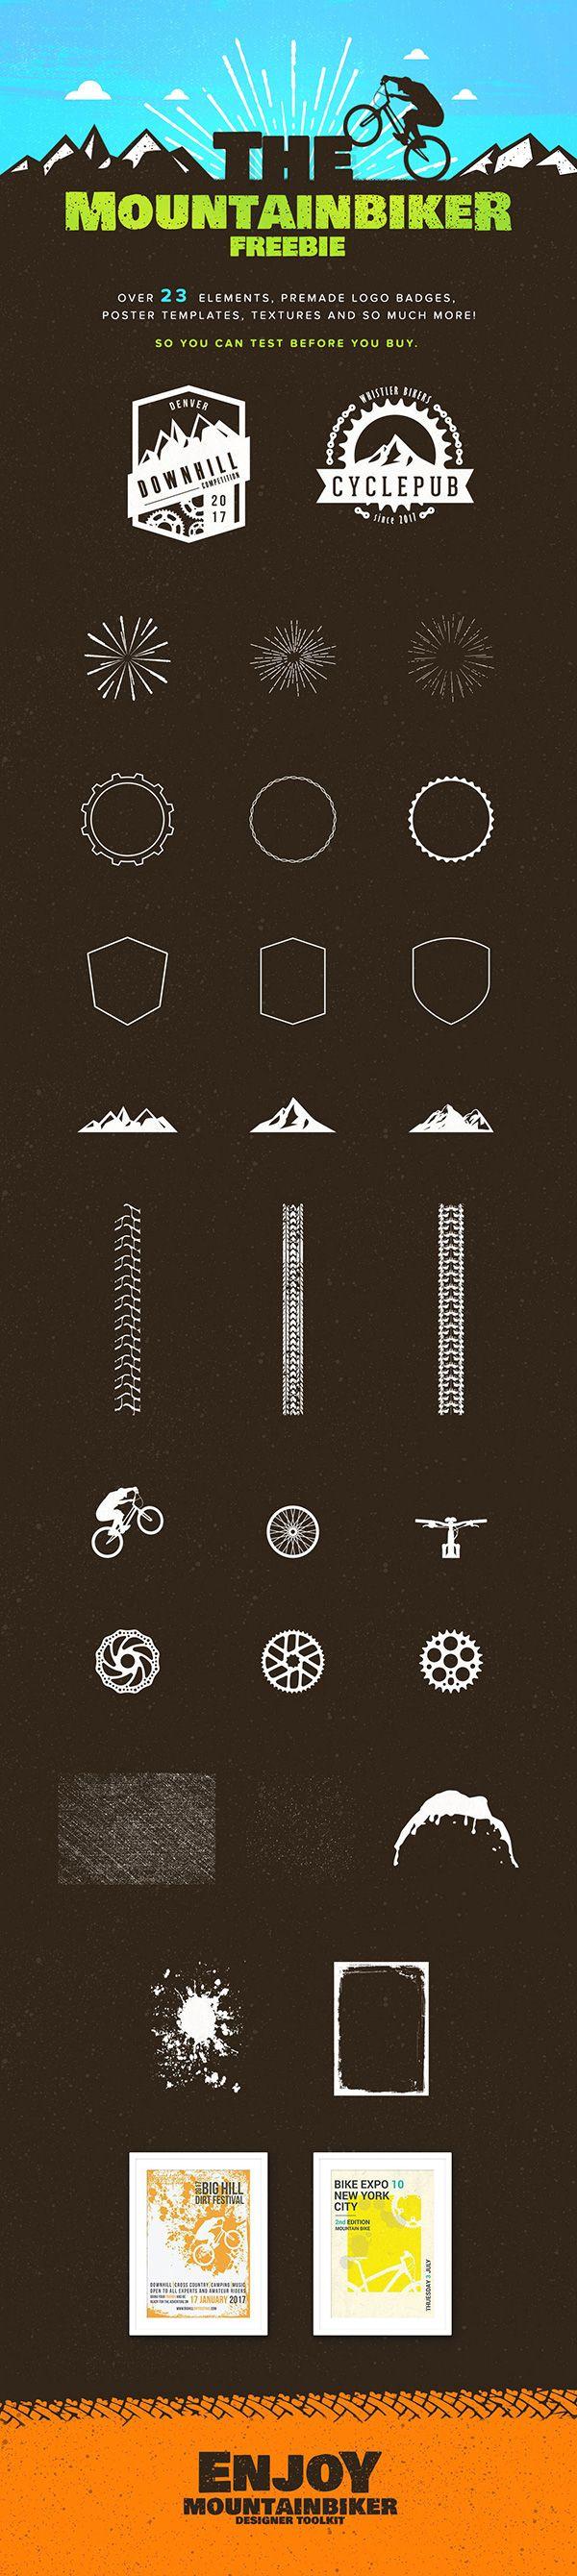 17 best ideas about create logo create logo 17 best ideas about create logo create logo for logo making software and googledrive com login